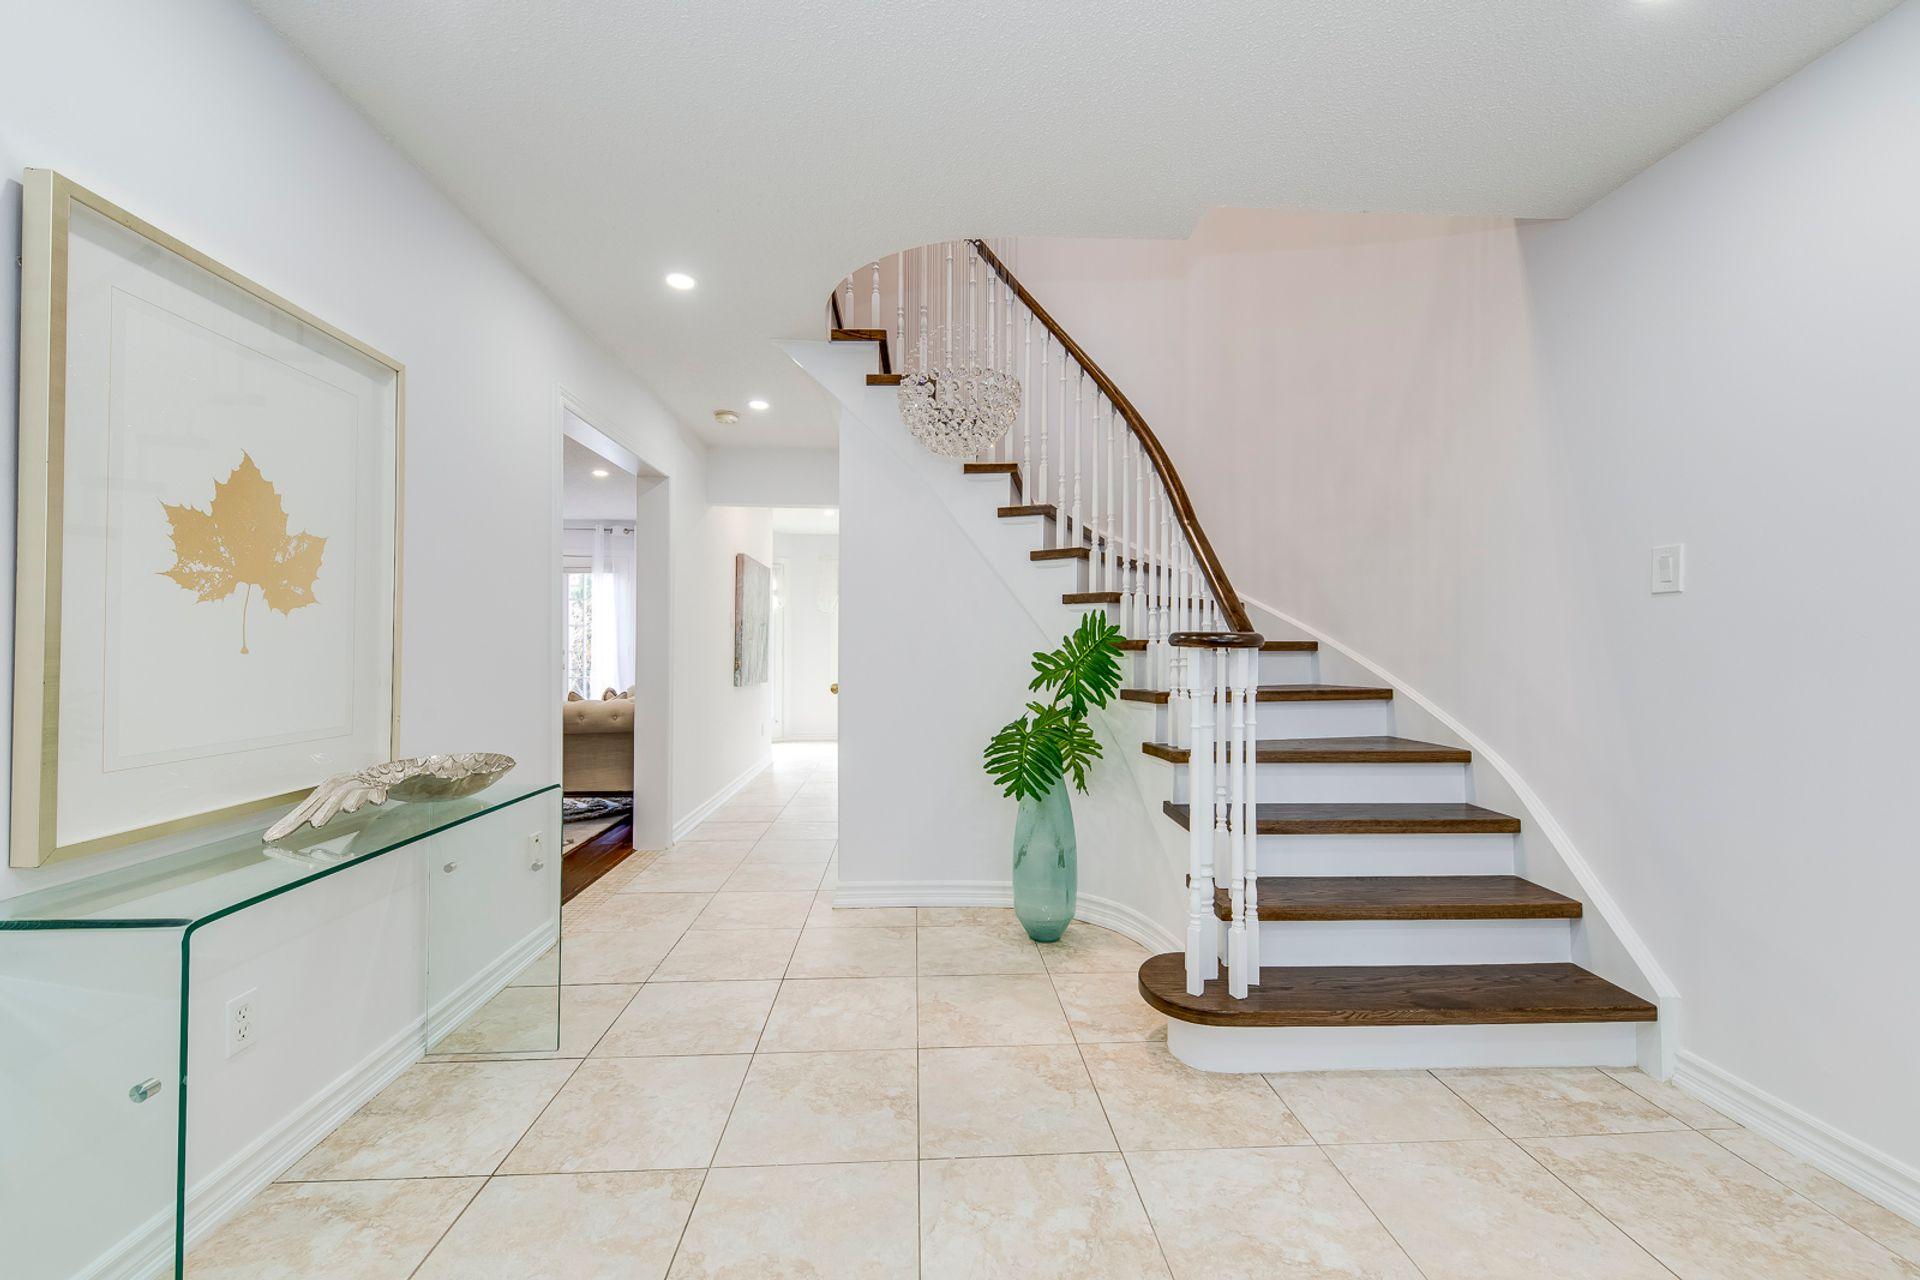 Foyer - 2791 Mahogany Lane, Oakville - Elite3 & Team at 2791 Mahogany Lane, Clearview, Oakville